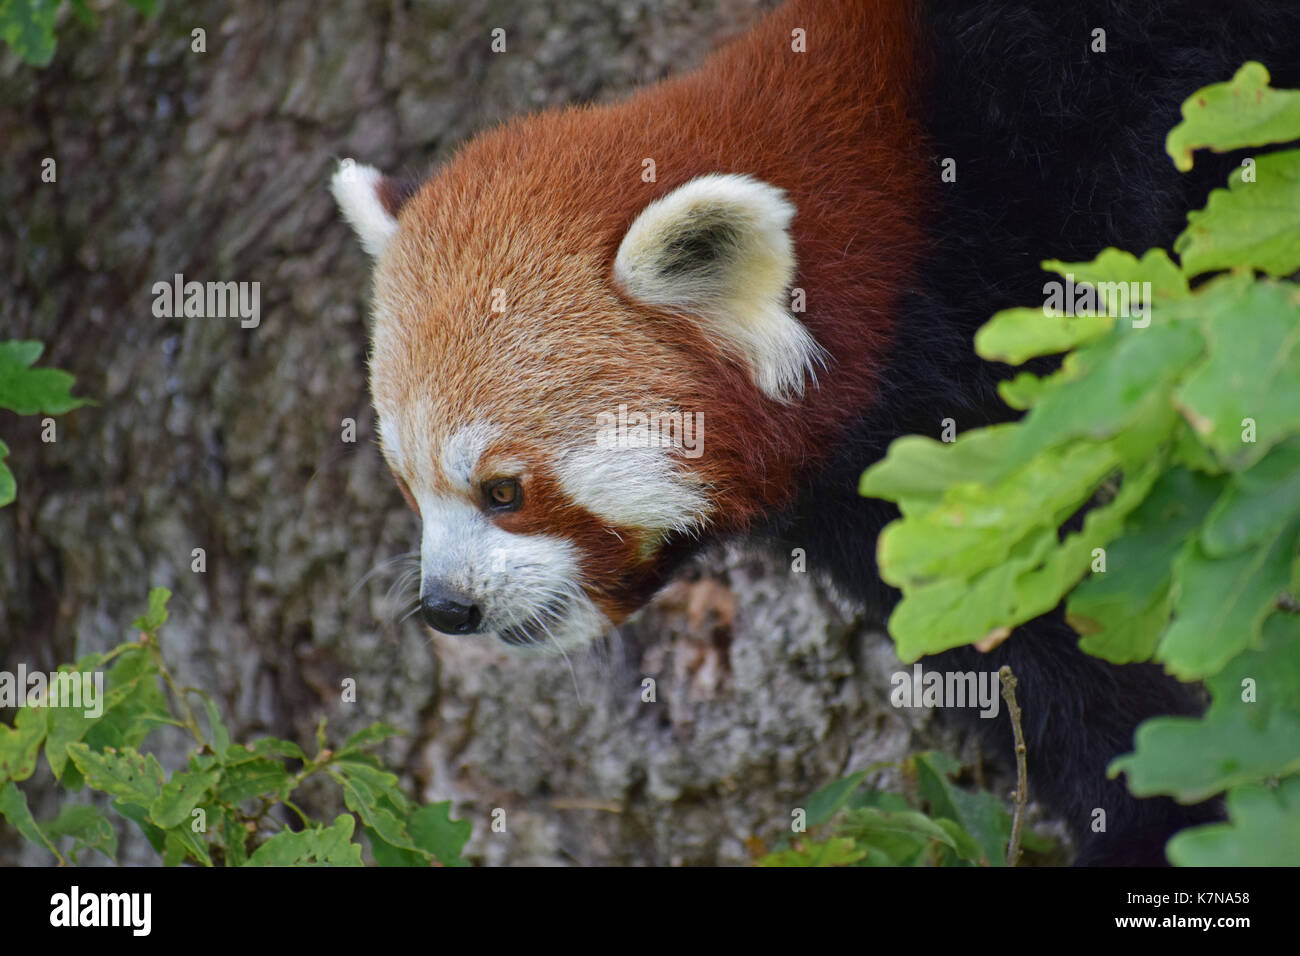 Red Panda - Lake District Wildlife Park, Bassenthwaite, Keswick, Lake District, North West England Stock Photo